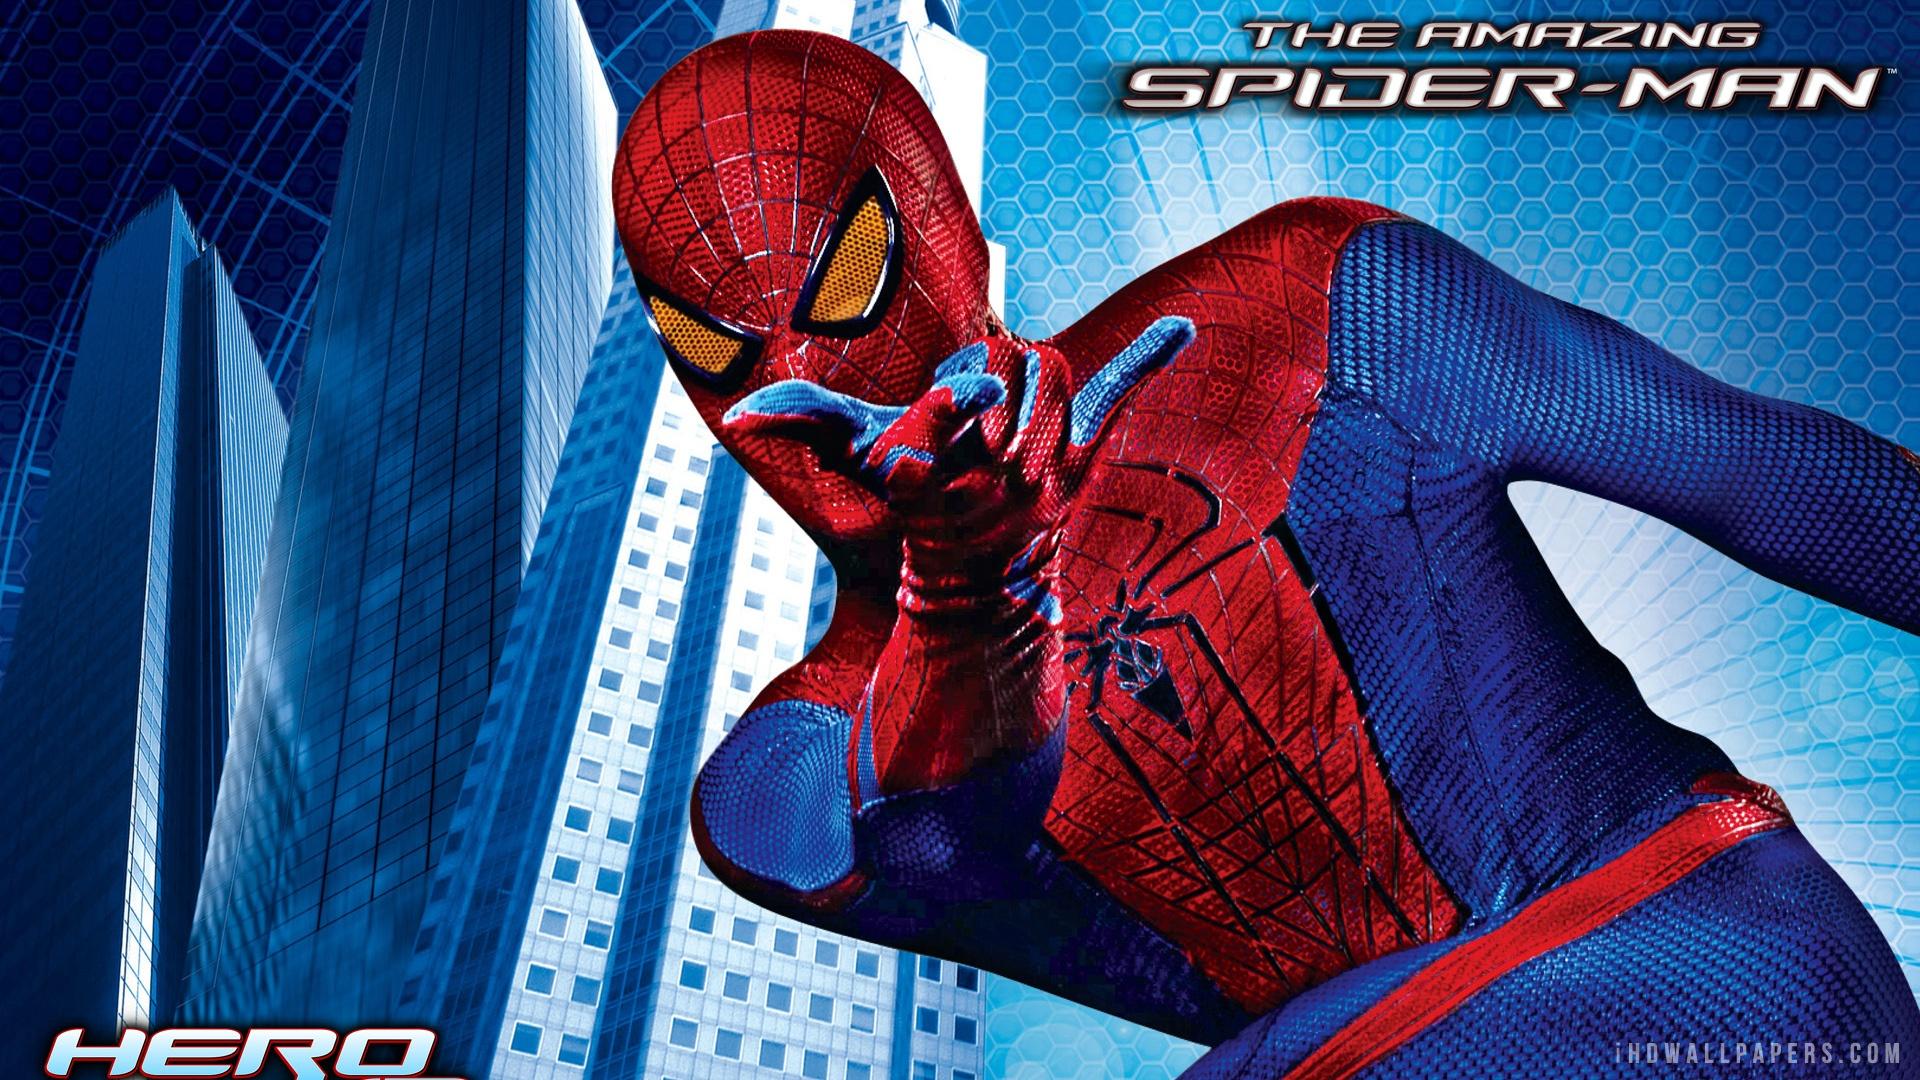 Spiderman HD Wallpaper 1920x1080 - WallpaperSafari